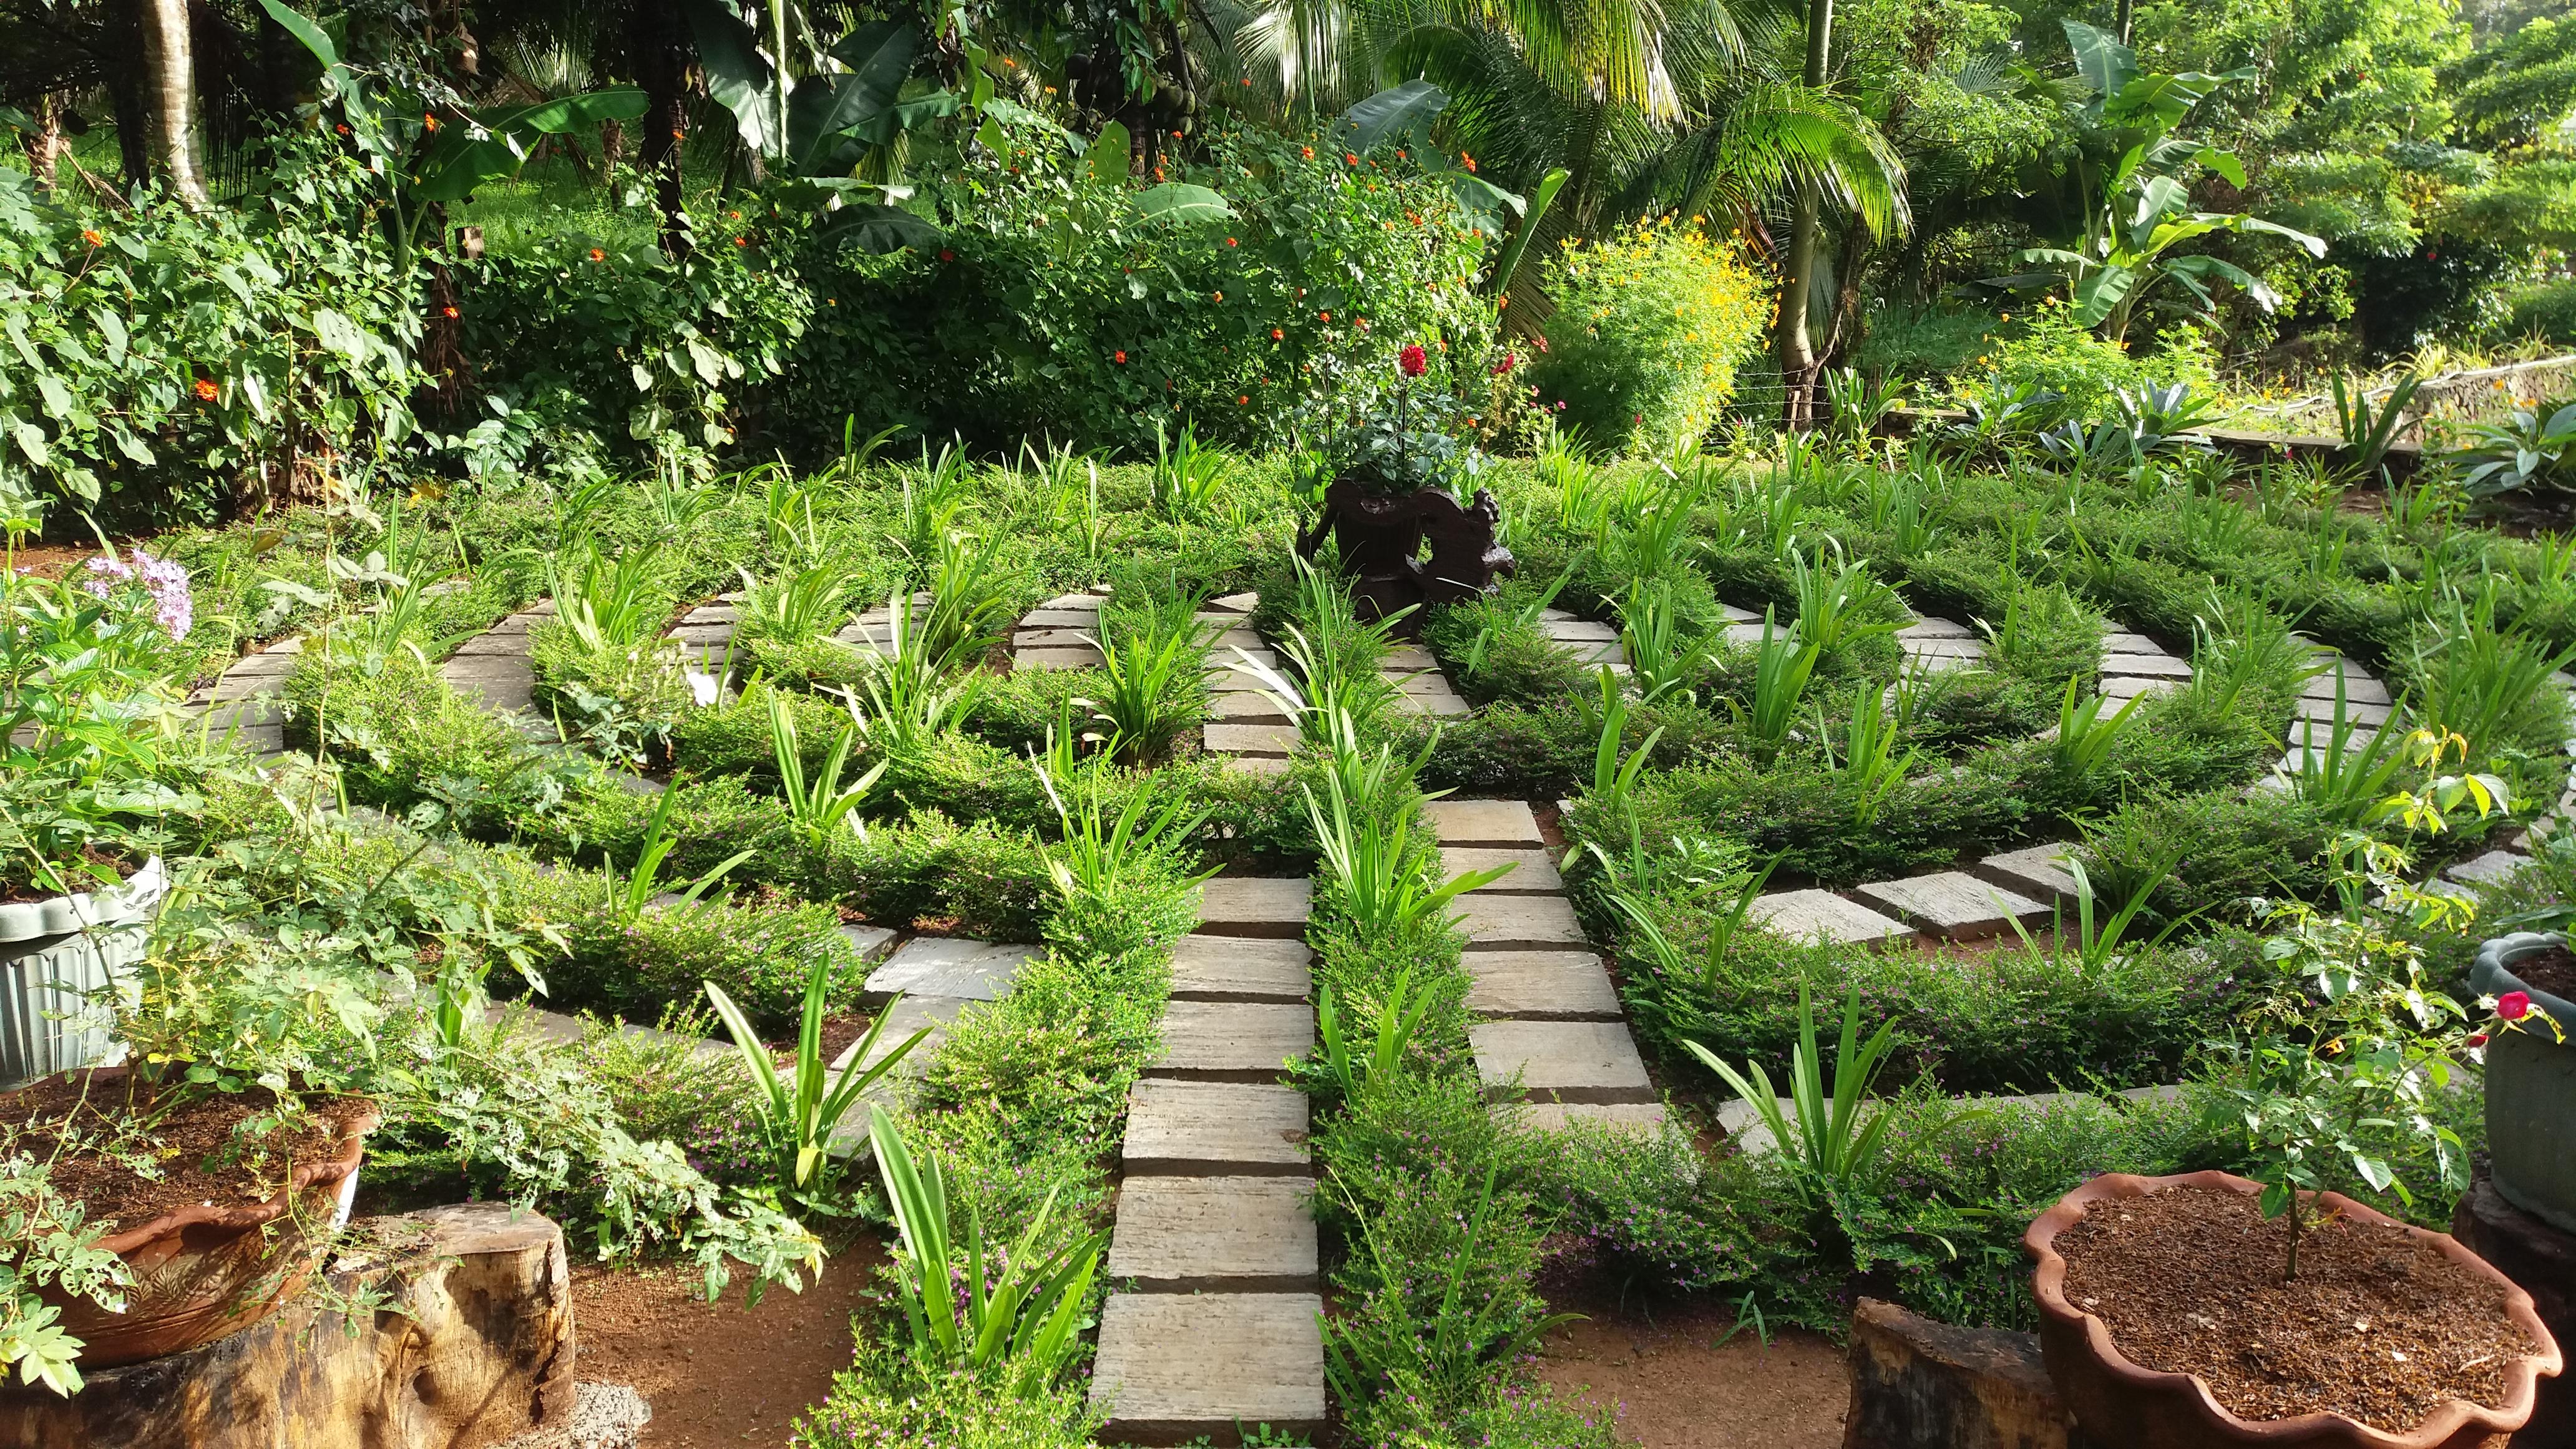 Labyrinth Garden